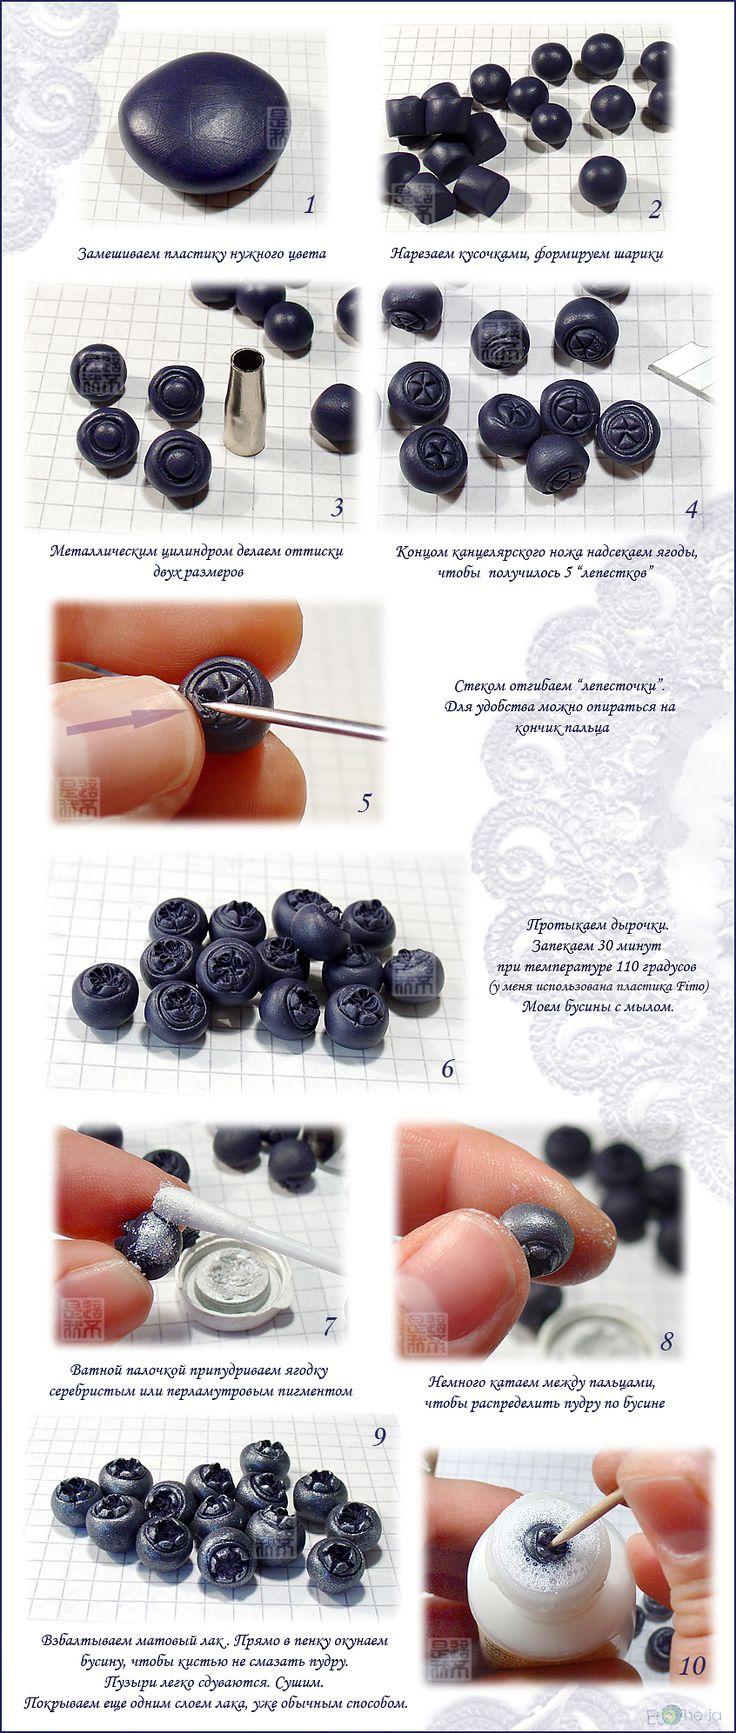 polymerclayfimo: Черника-голубика - урок